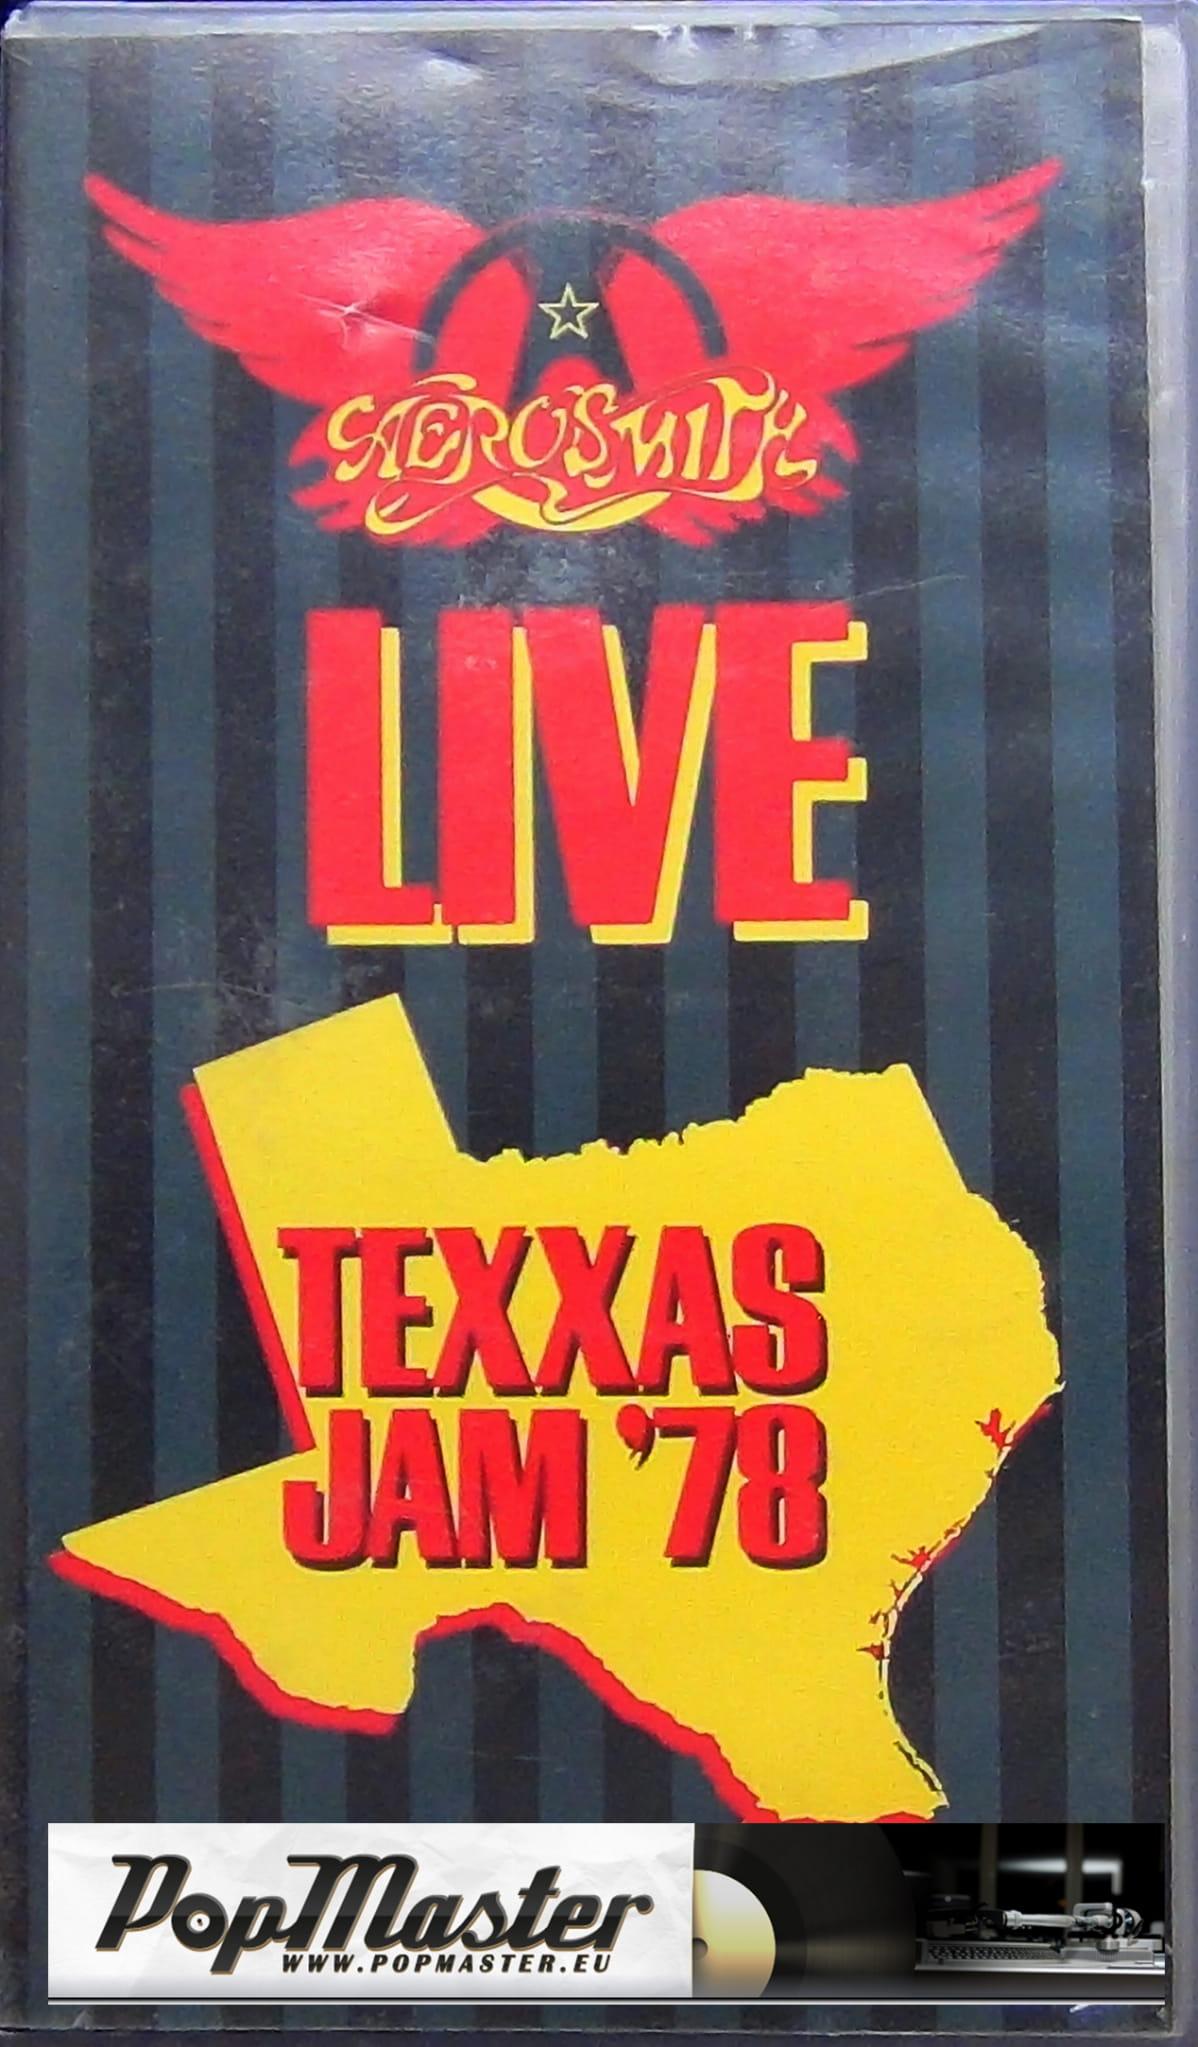 Aerosmith Live Texxas Jam 78 200811 2 Vhs Kaseta Www